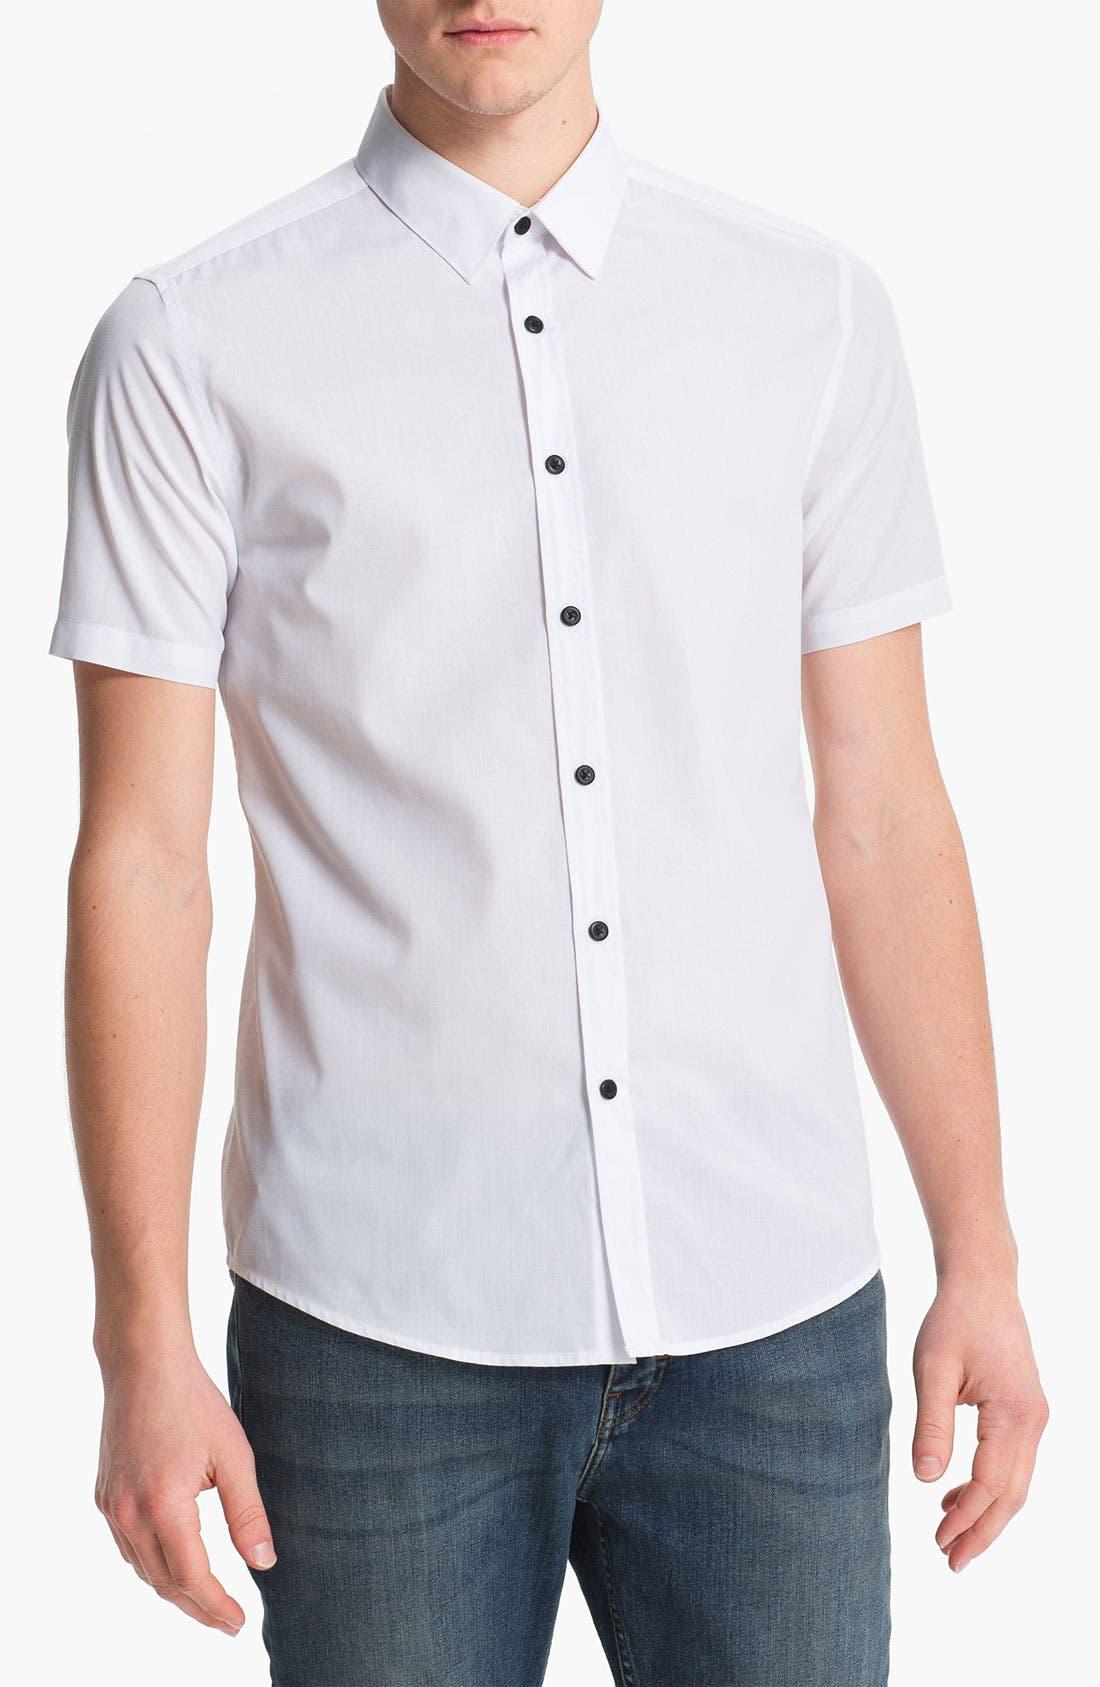 Main Image - Topman 'Smart' Short Sleeve Shirt